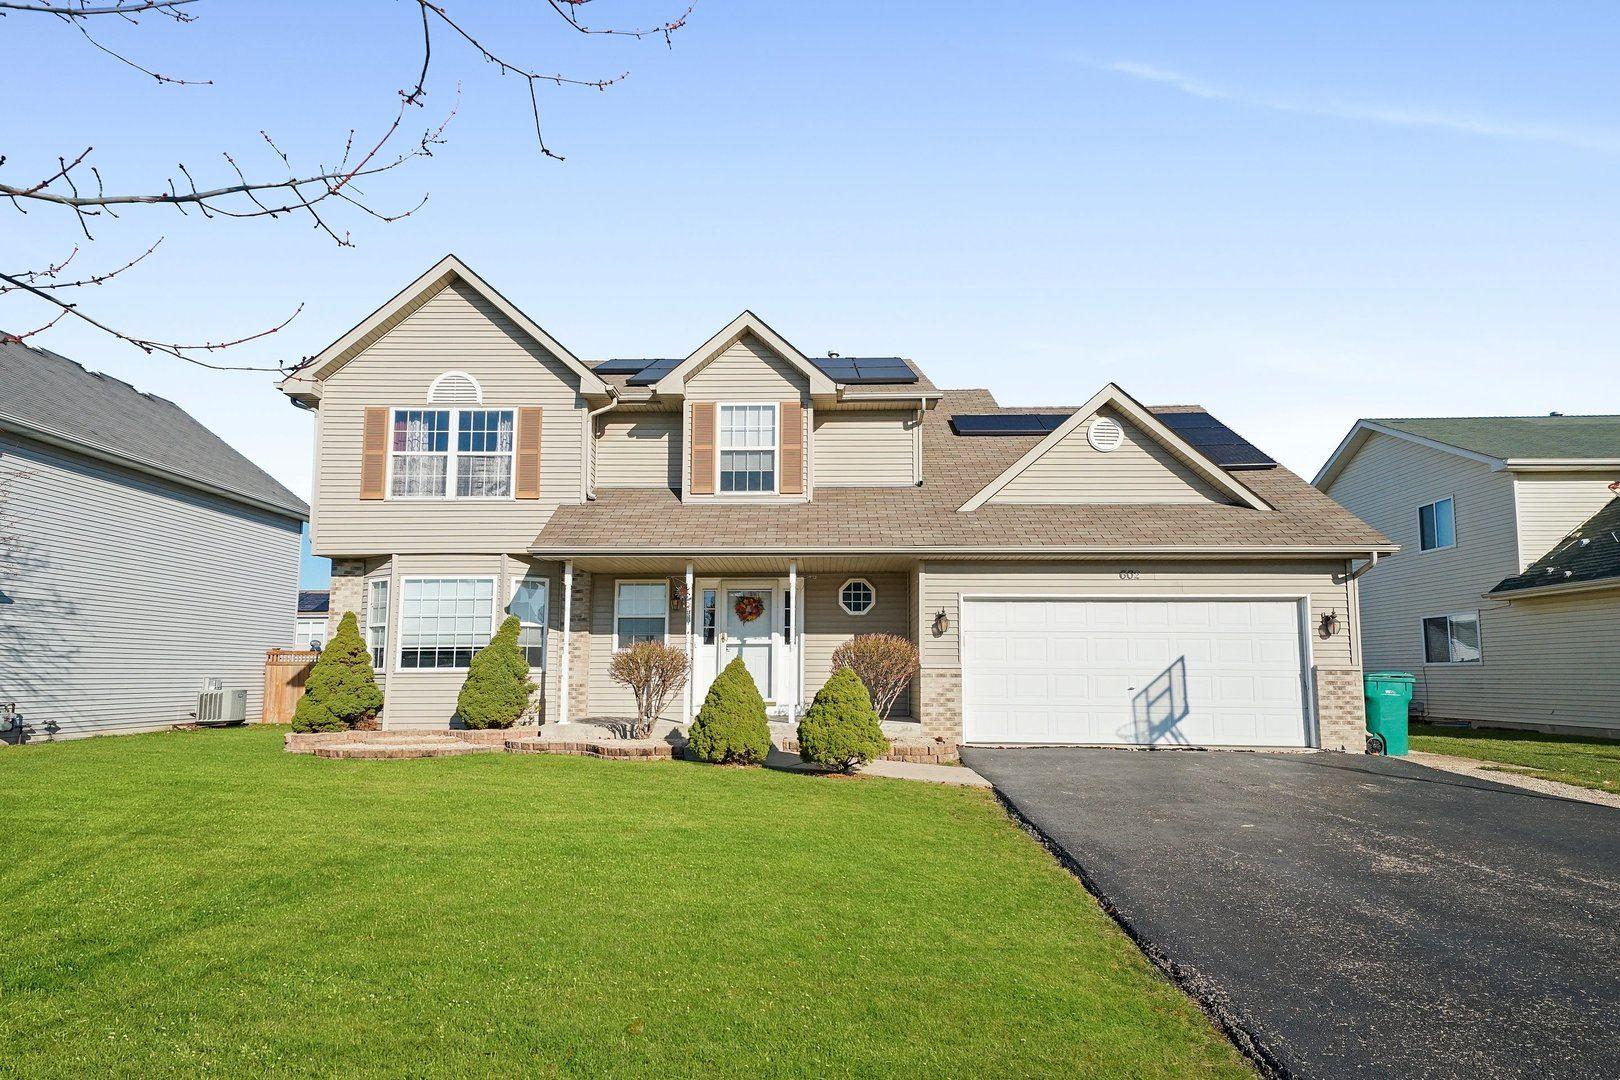 Photo of 602 HEINTZ Drive, Shorewood, IL 60404 (MLS # 10942052)